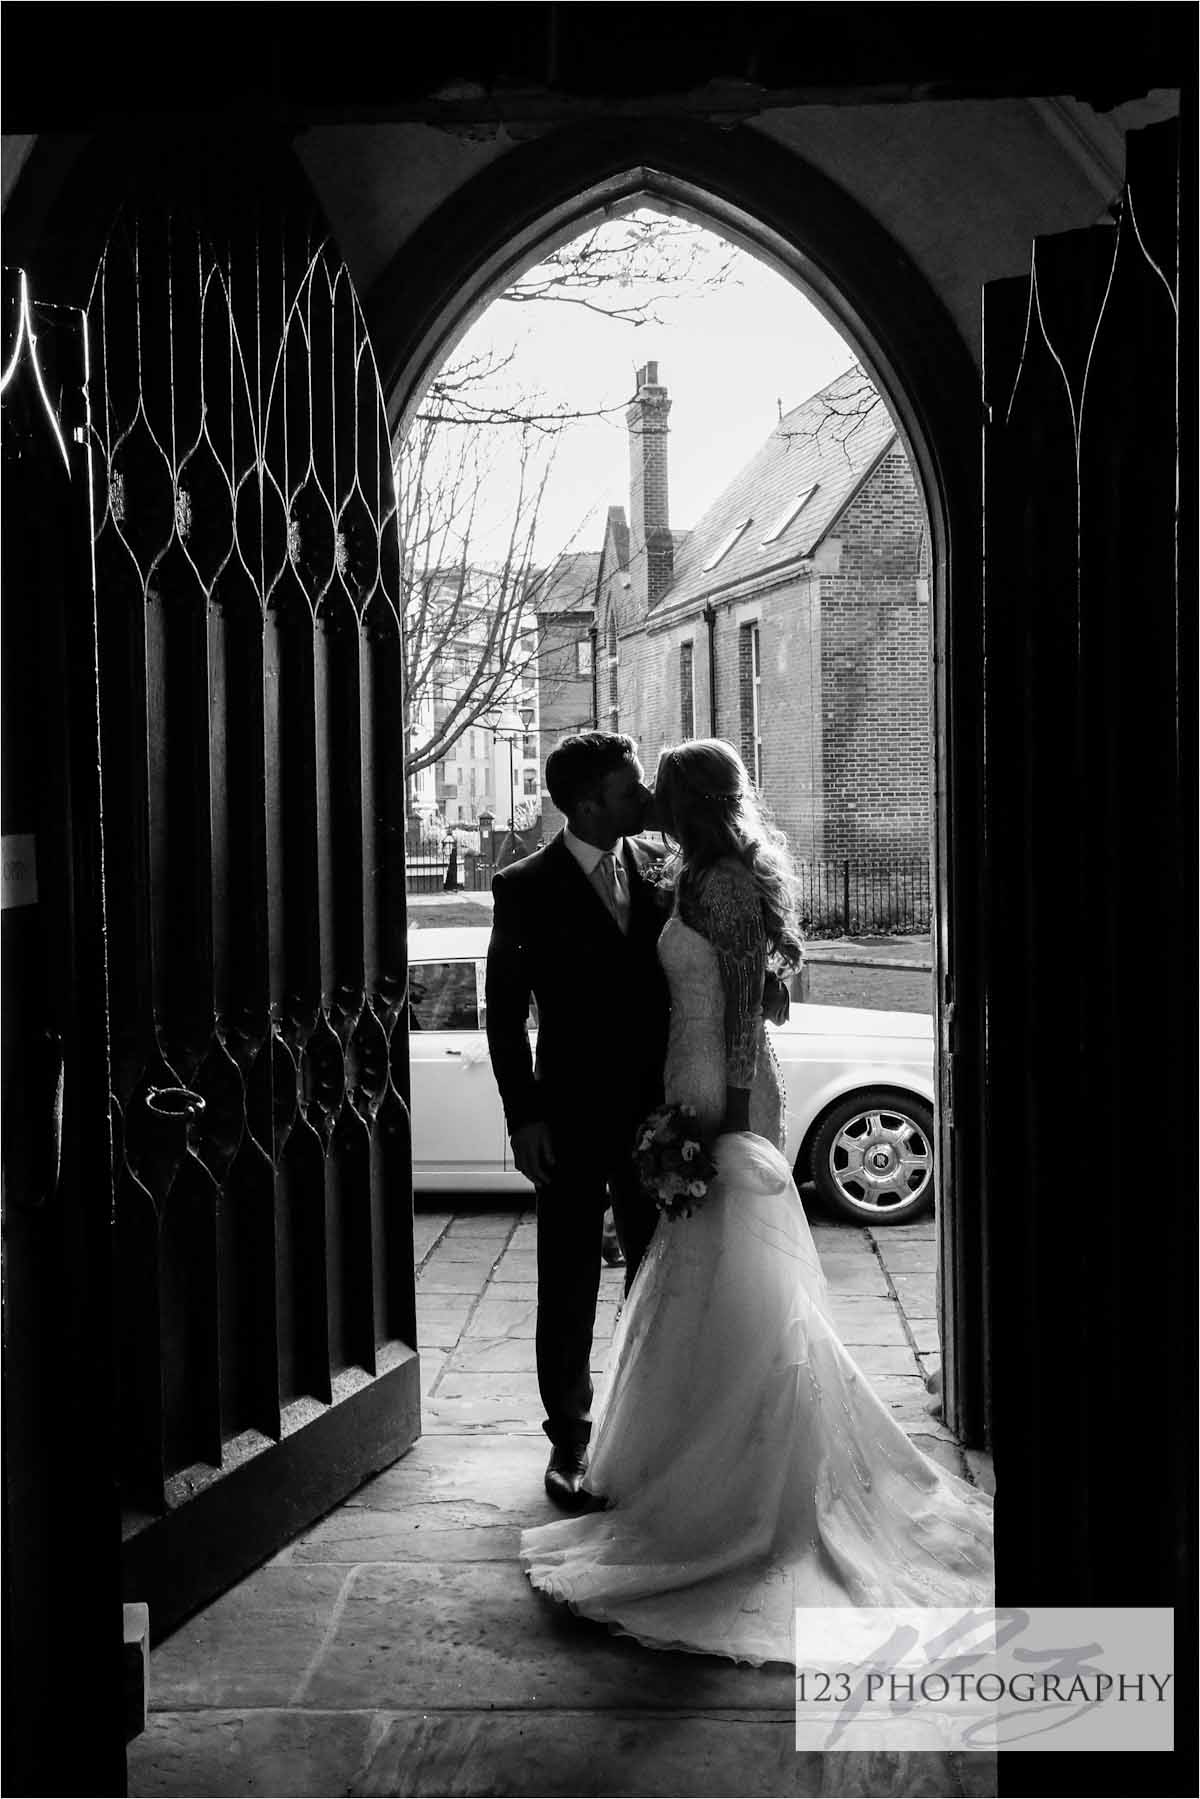 Leeds Minster wedding photography